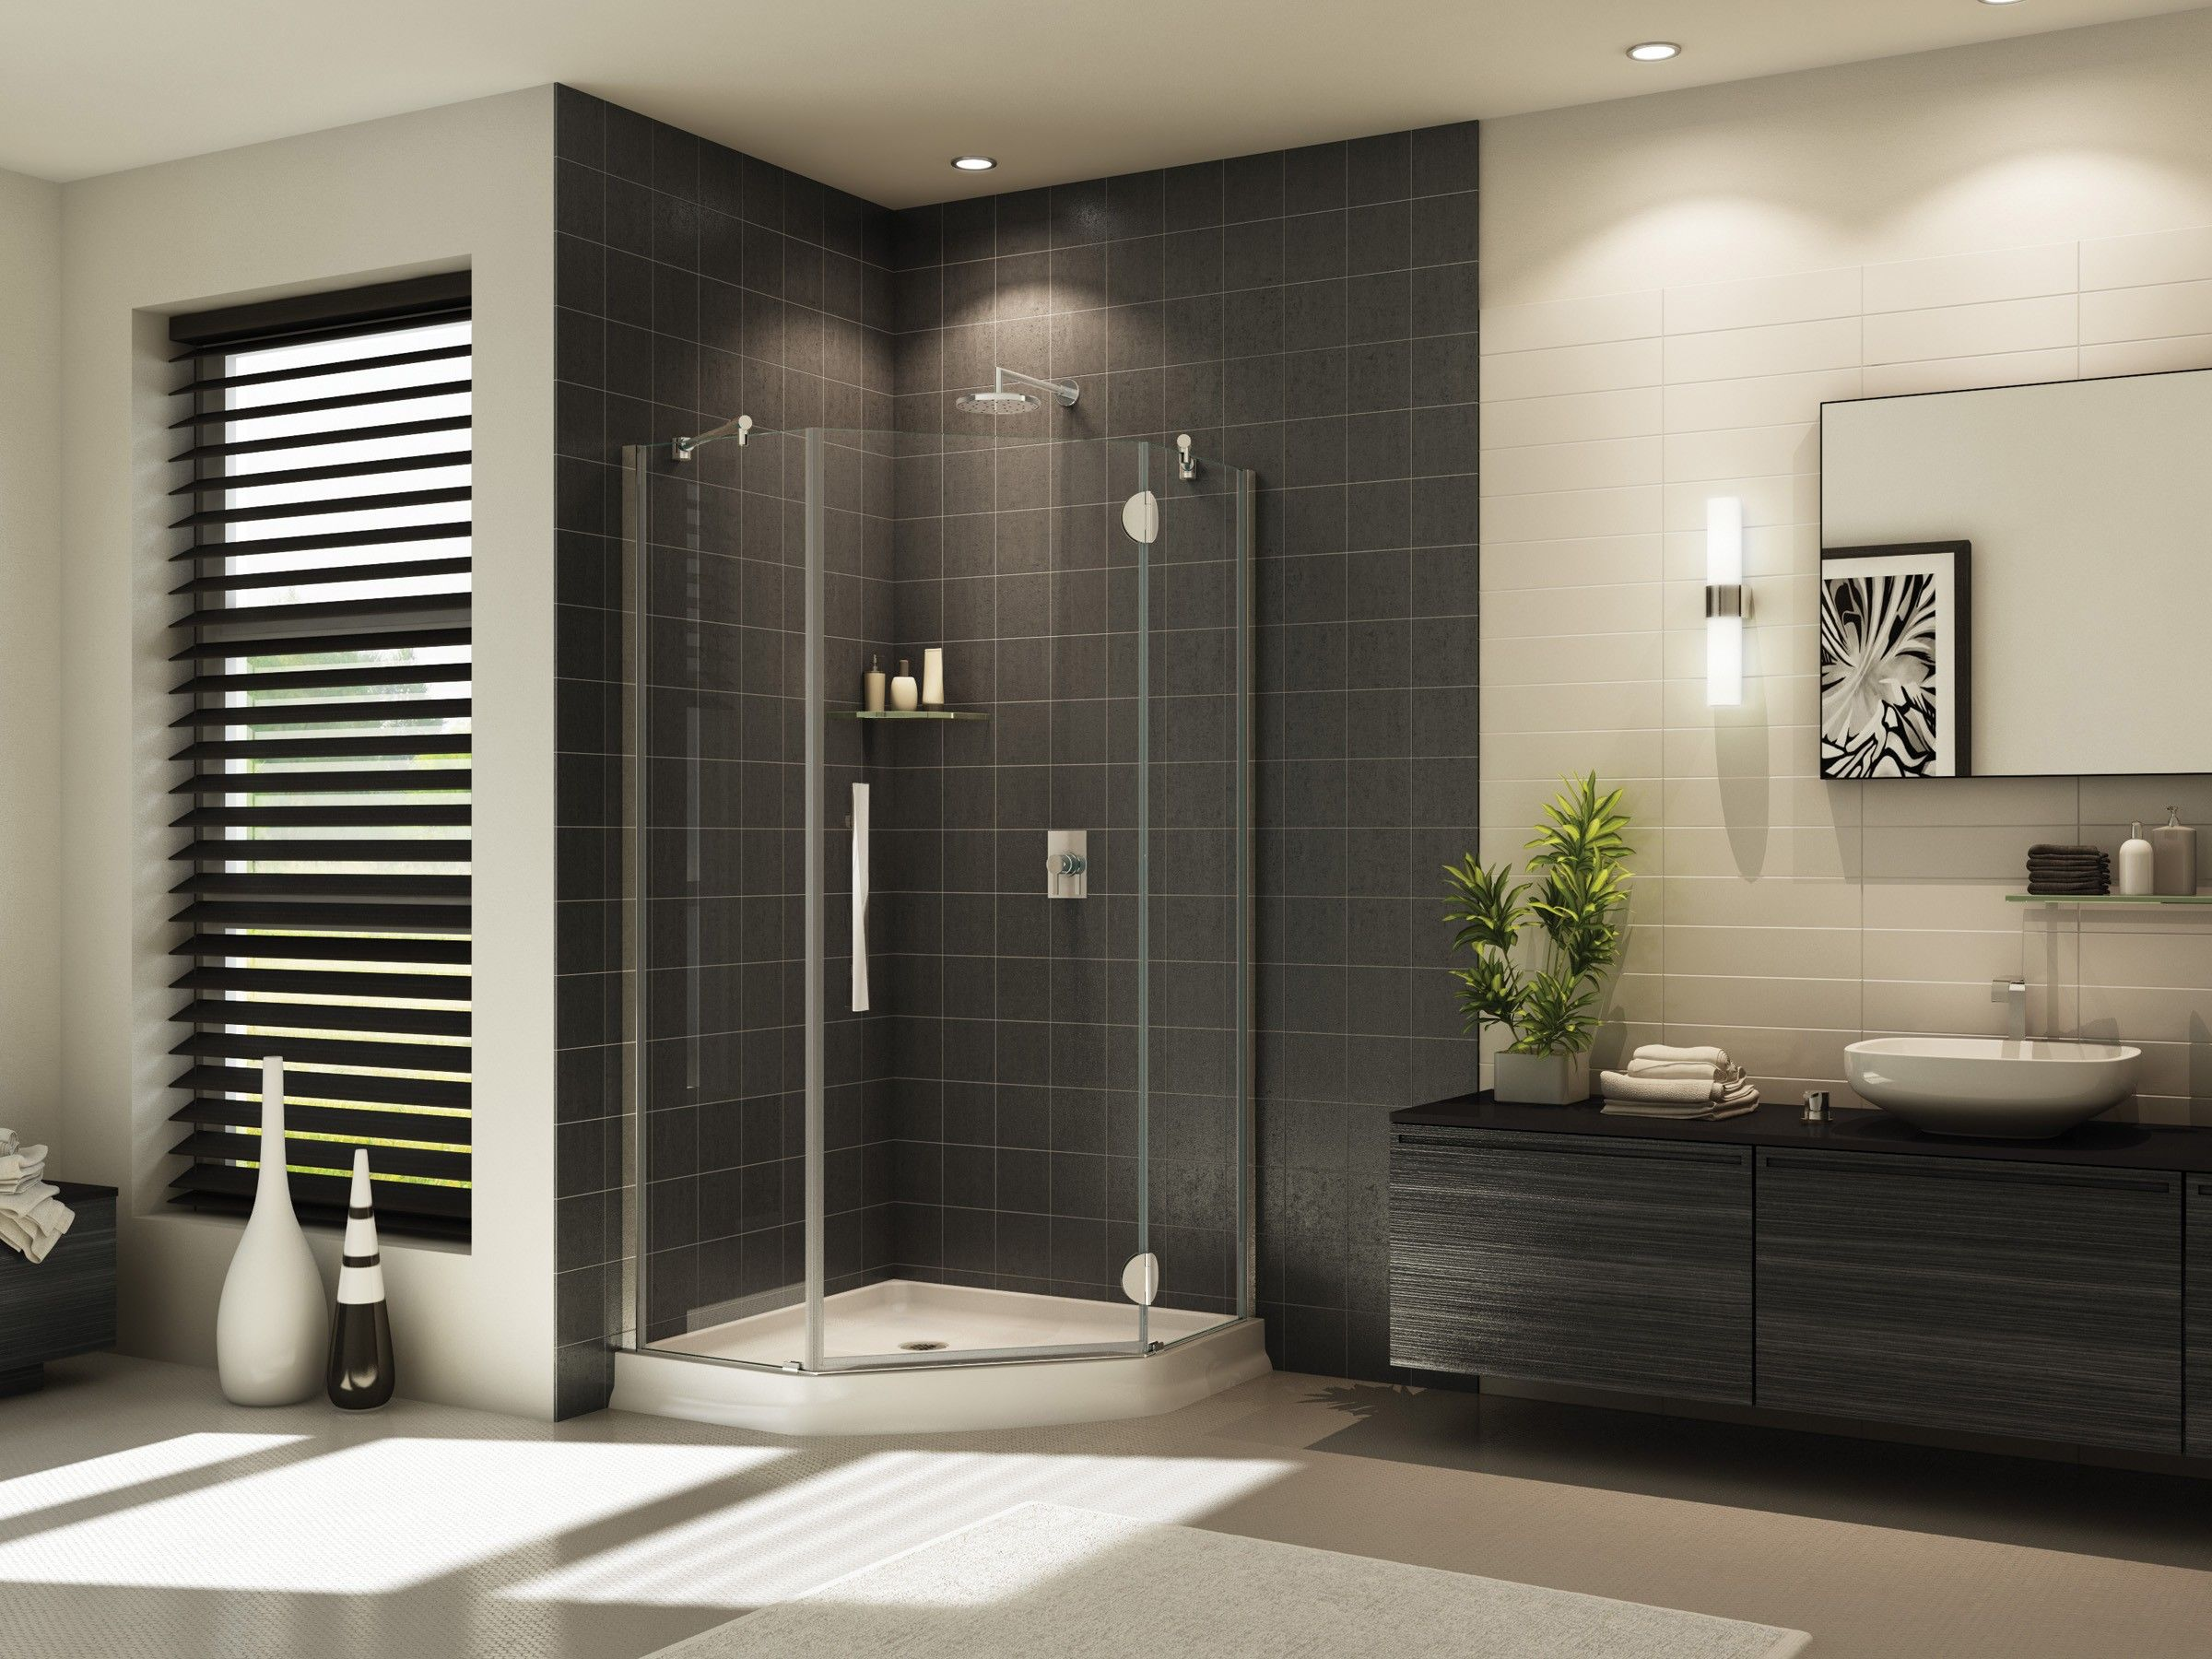 92 best Shower & Tub Doors images on Pinterest   Bathroom tub shower ...